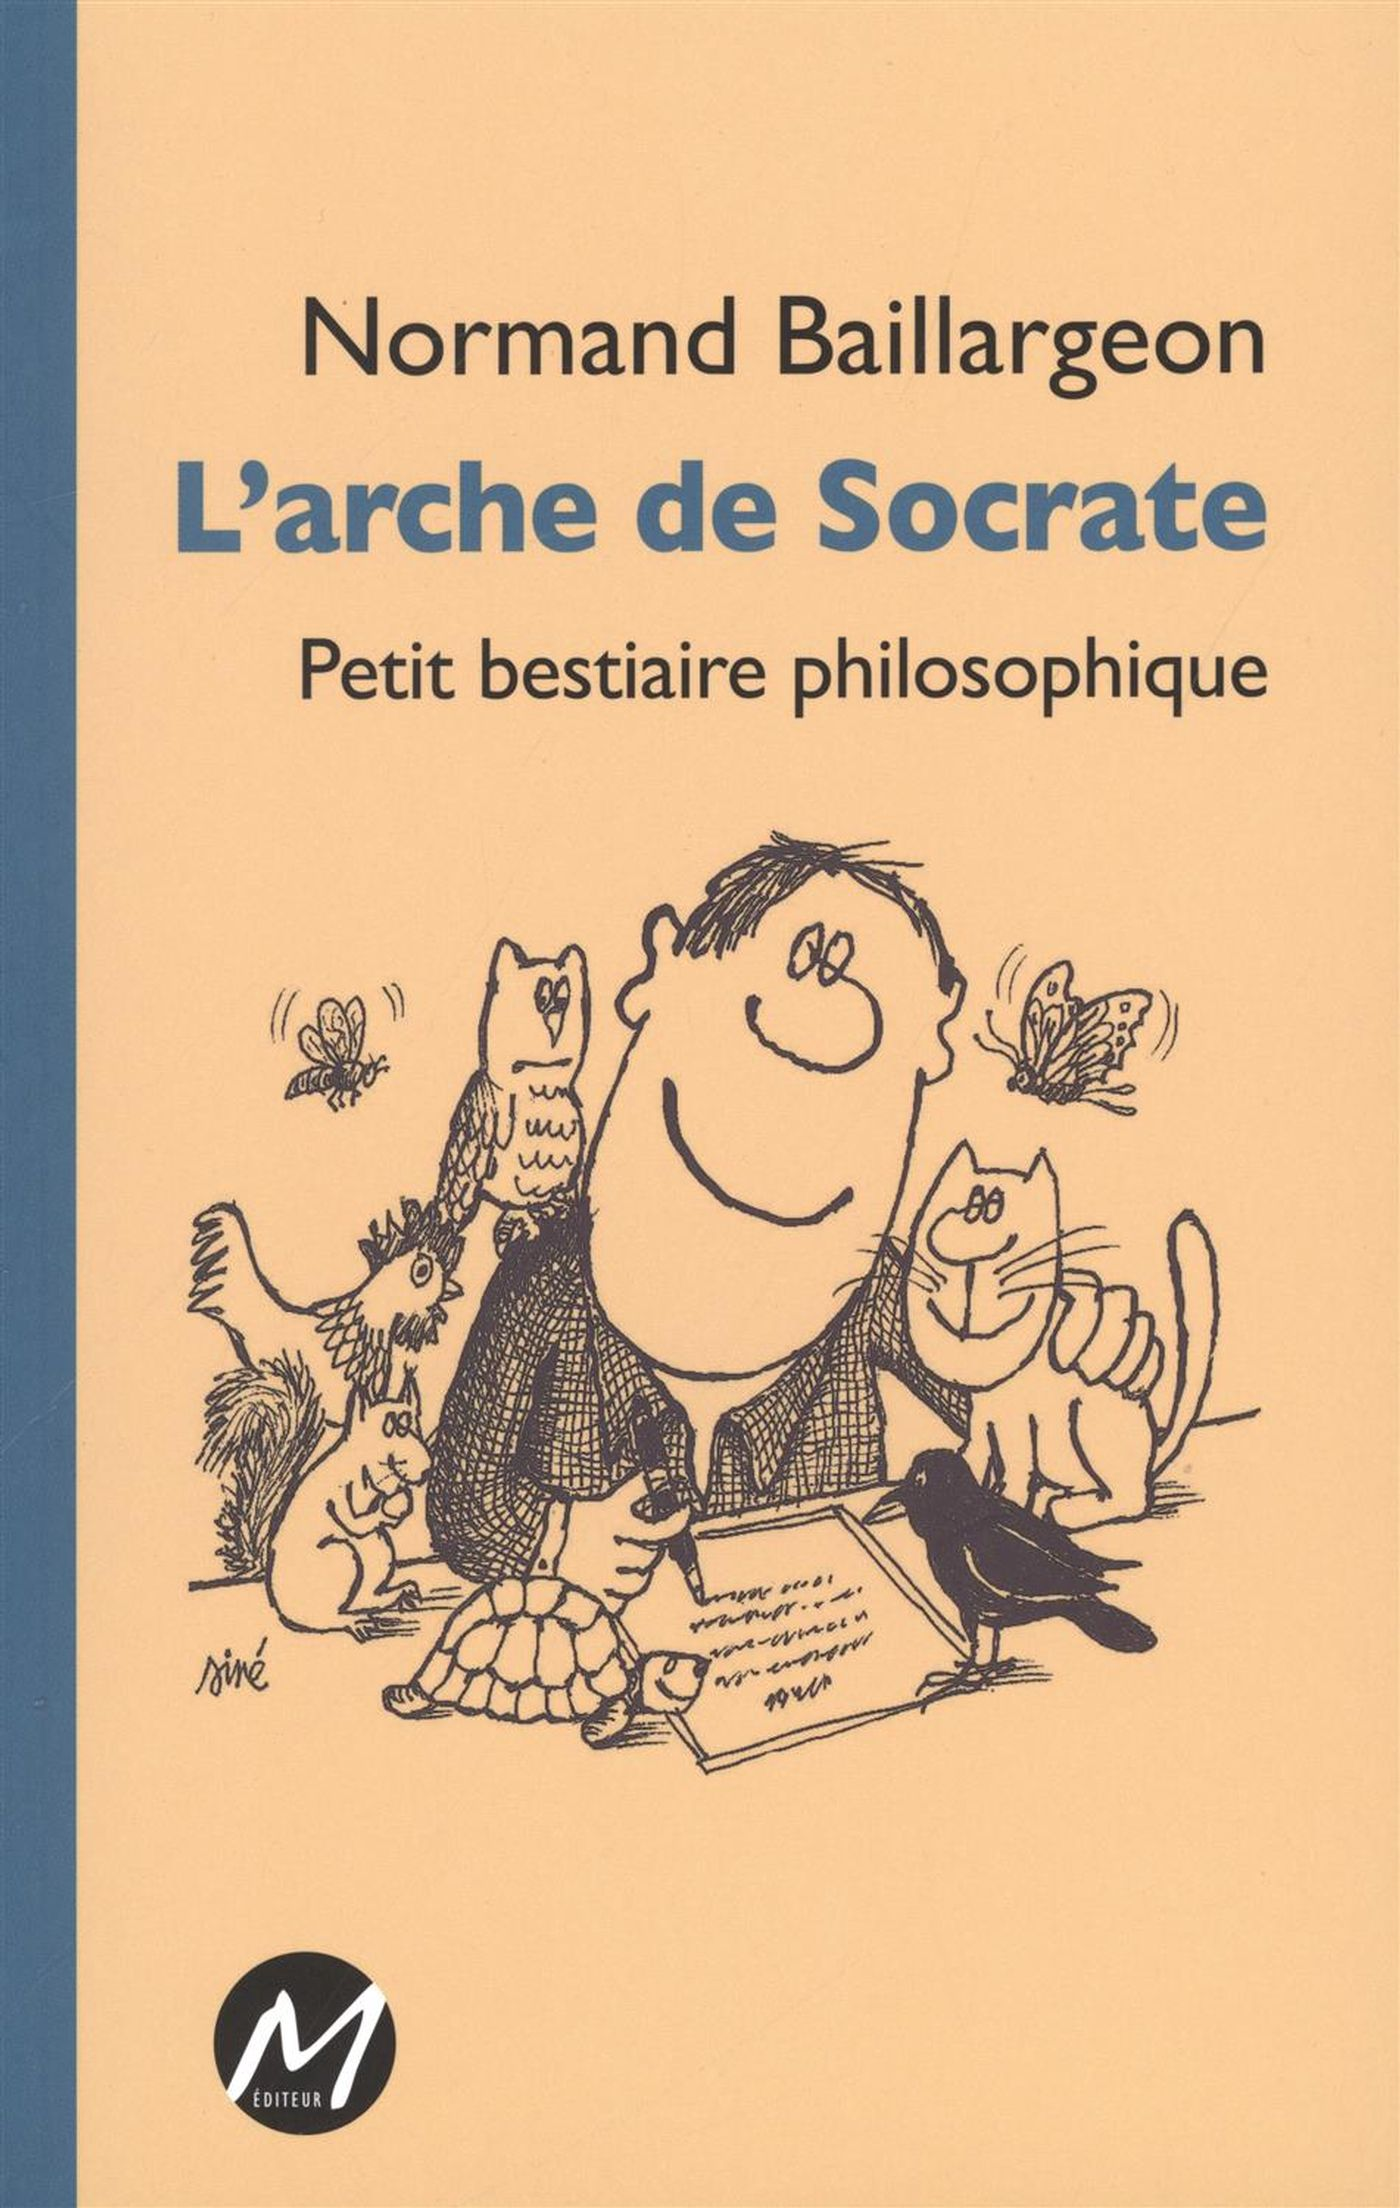 L'arche de Socrate